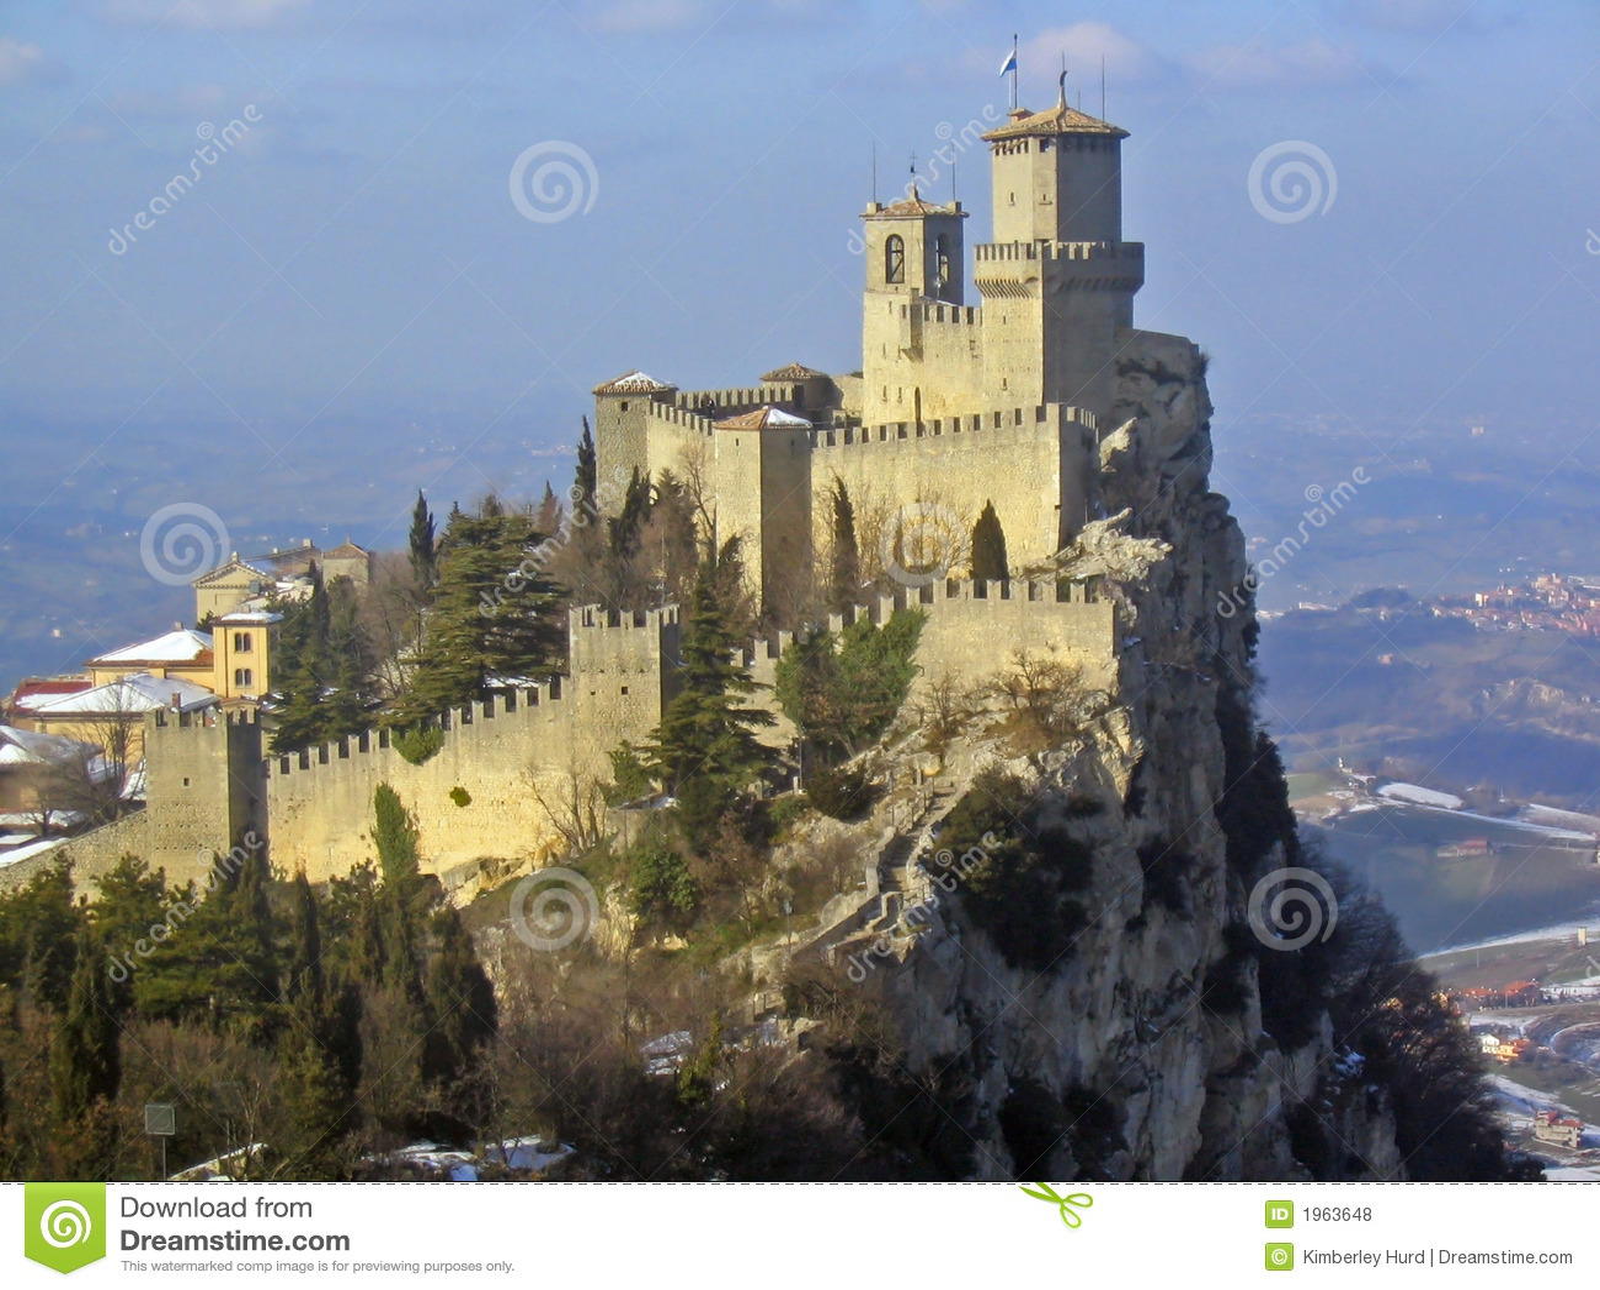 San marino, castle